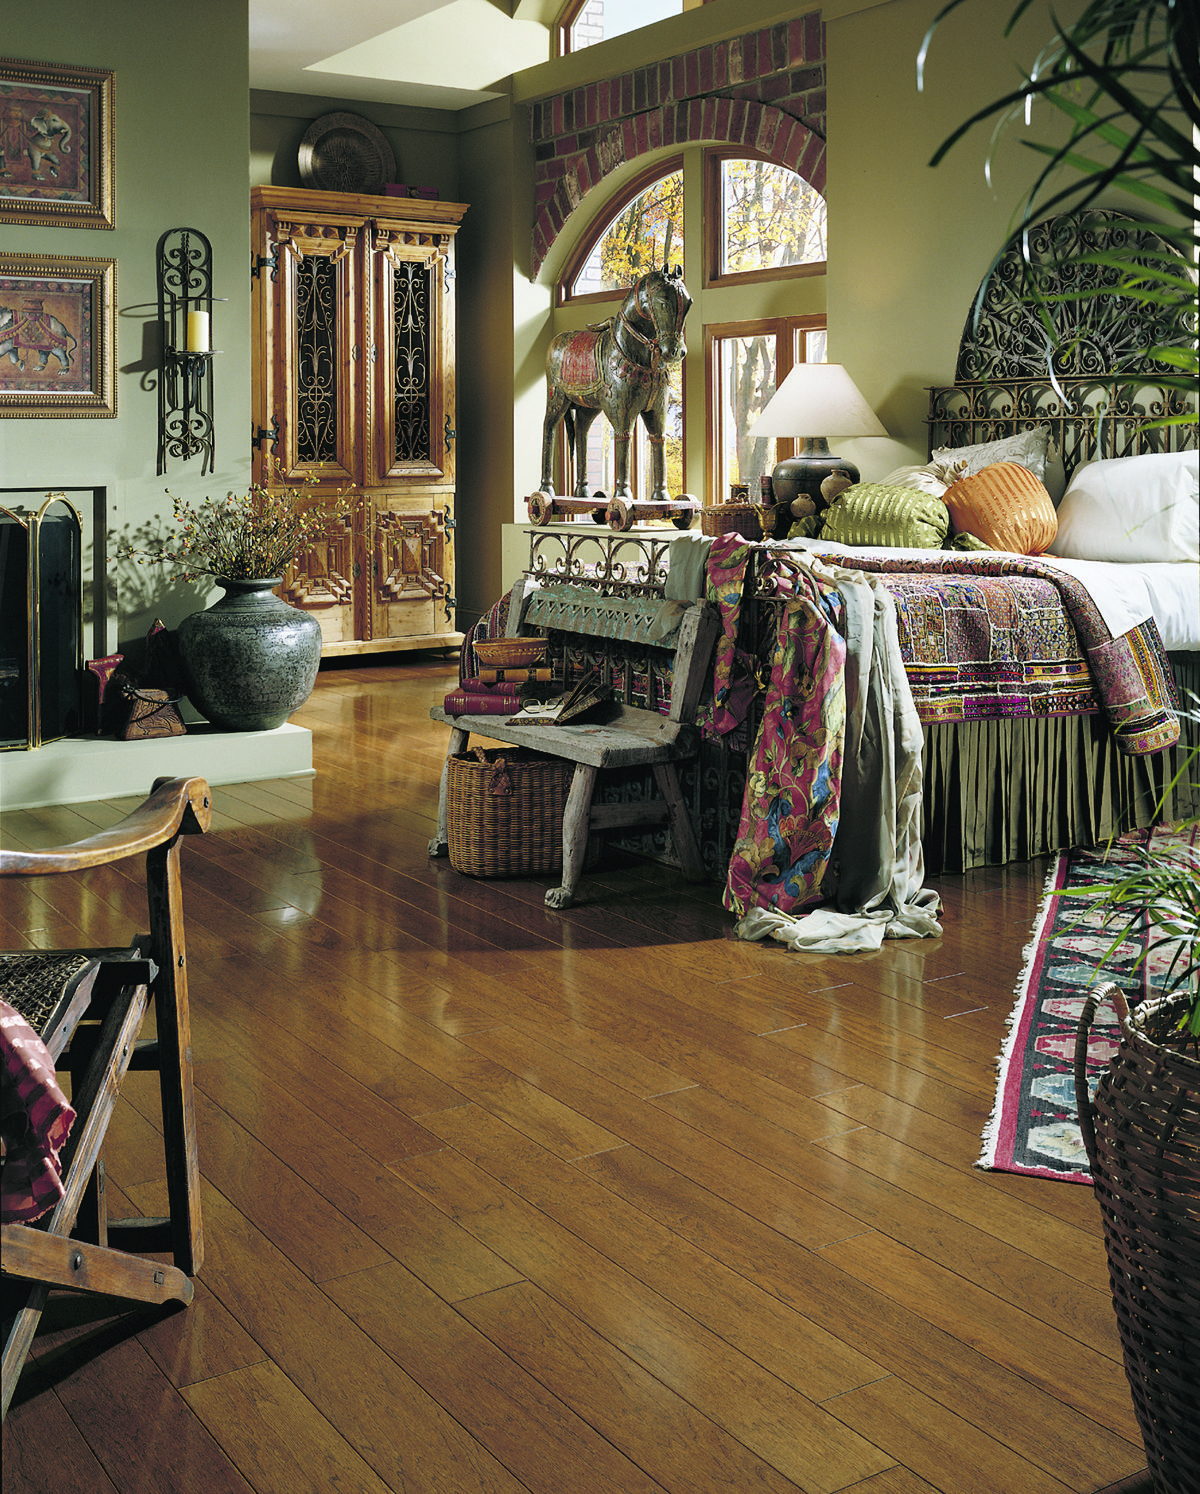 Mannington Hardwood Cherry Stain Hickory House flooring